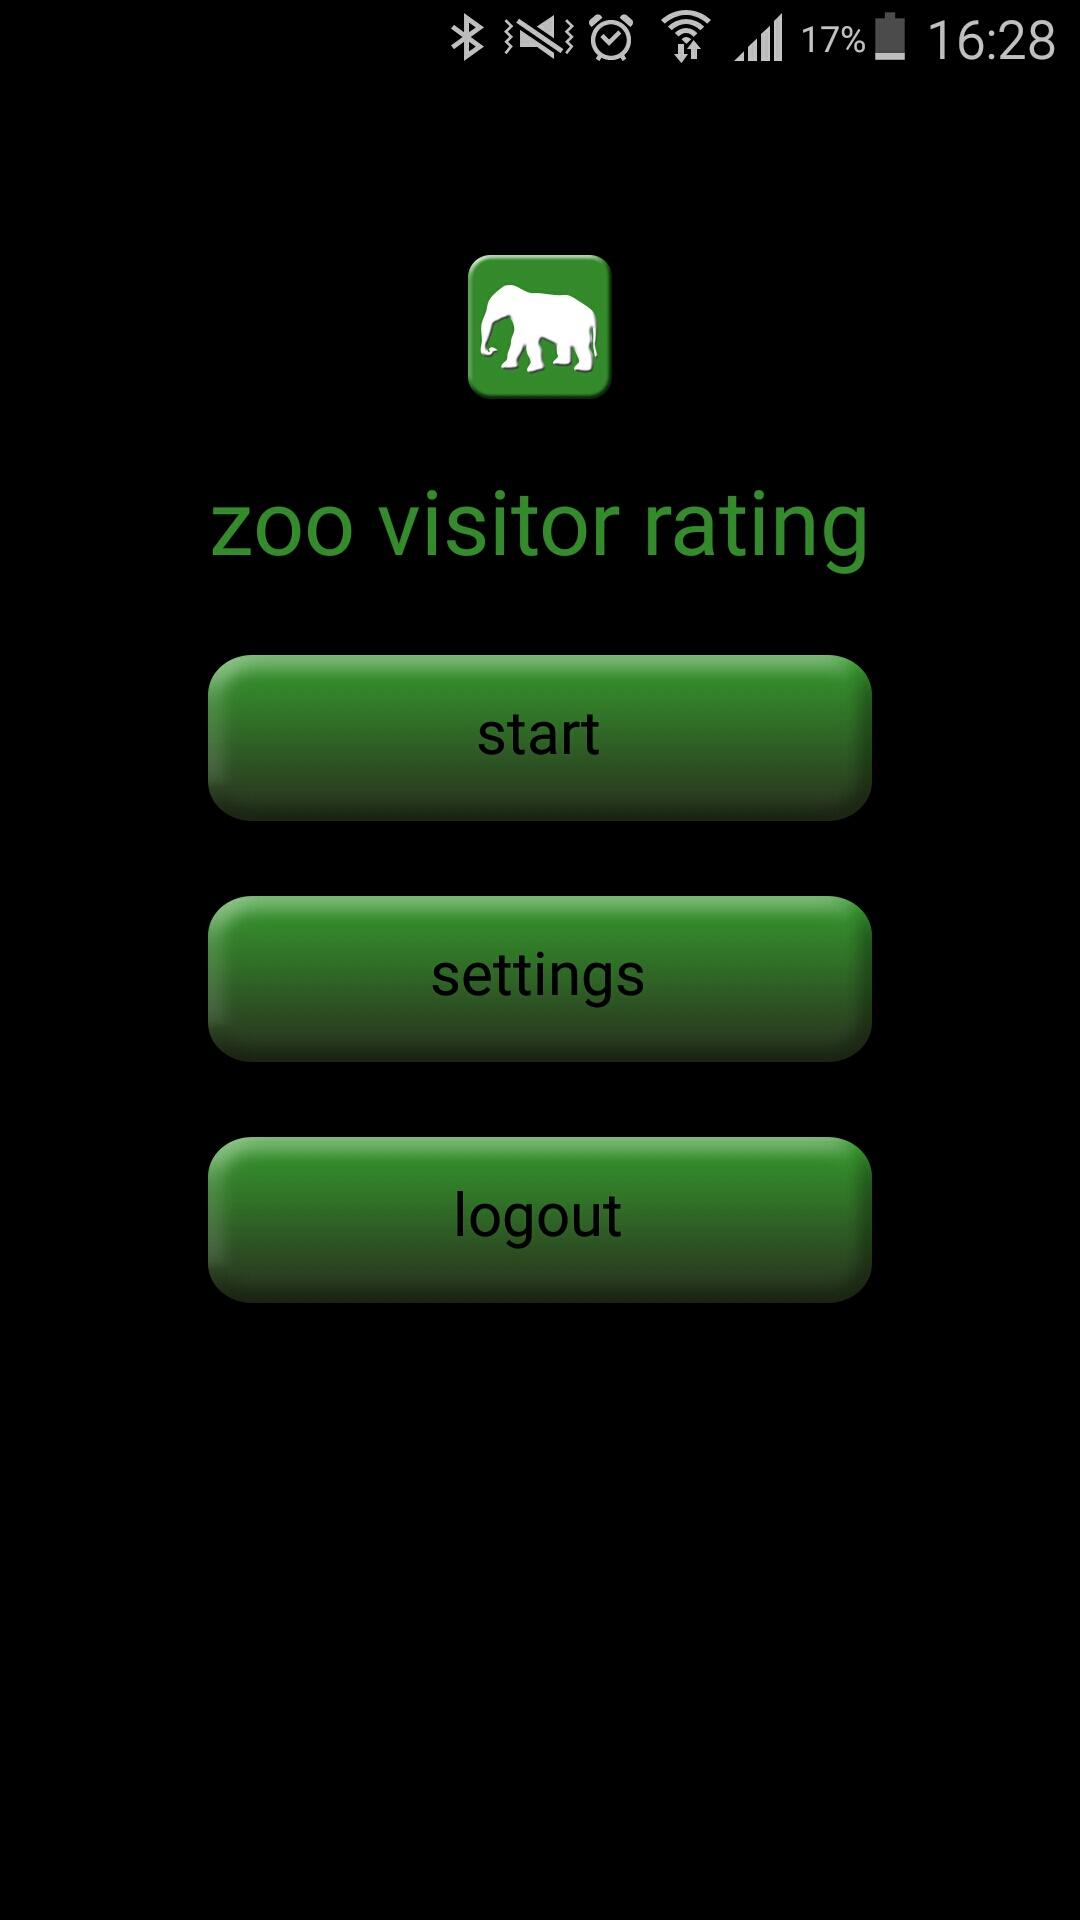 ginstr_app_zooVisitorRating_EN-2